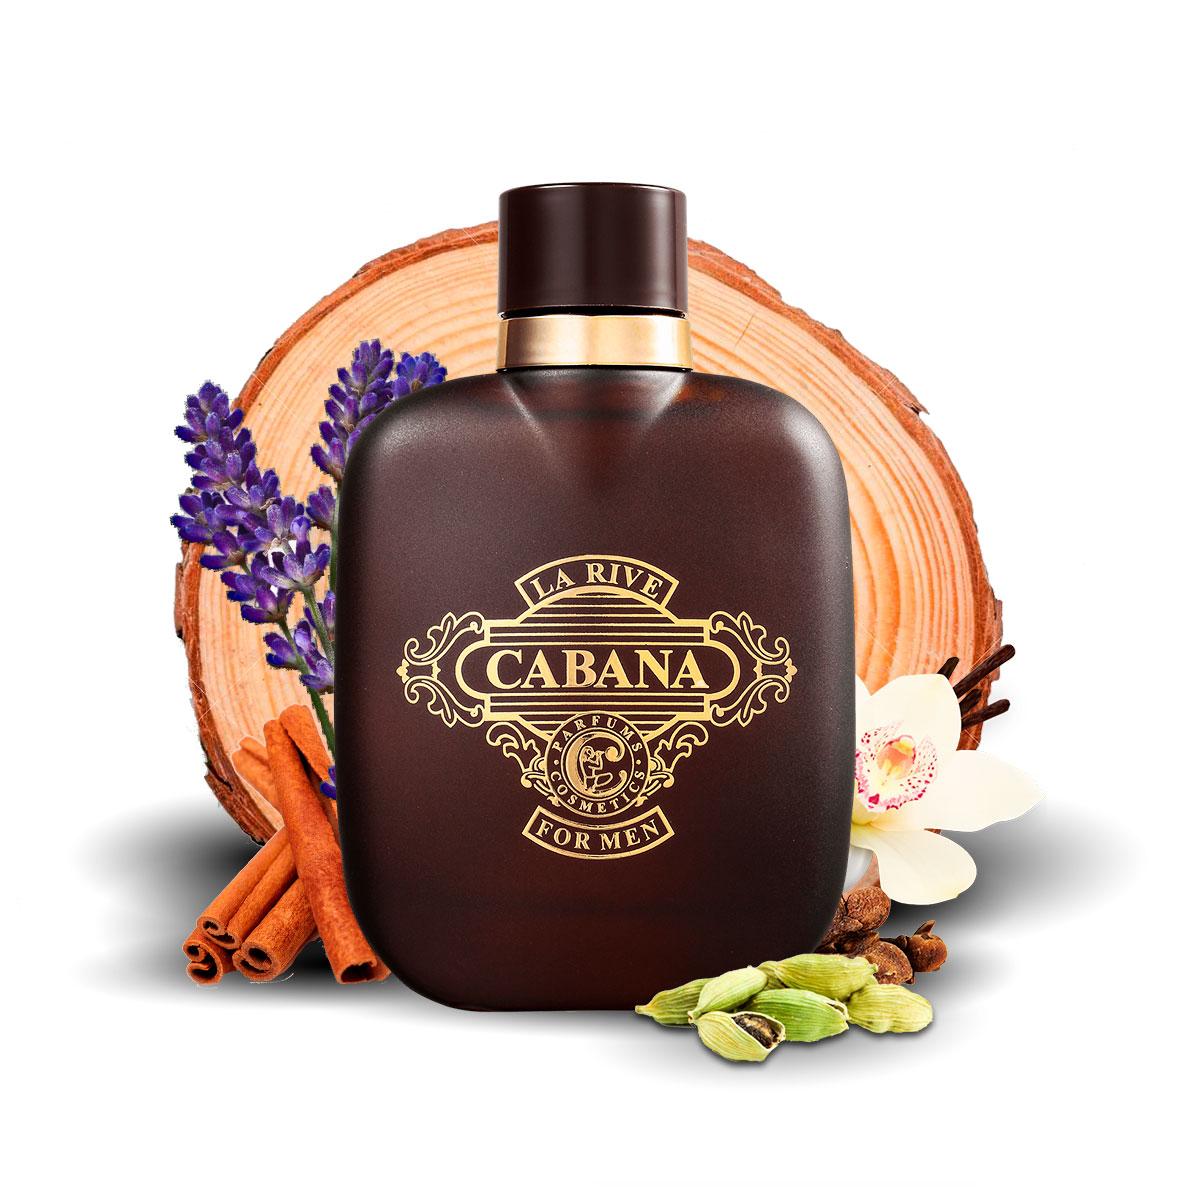 Kit 2 Perfumes Importados Cabana e Steel Essence La Rive